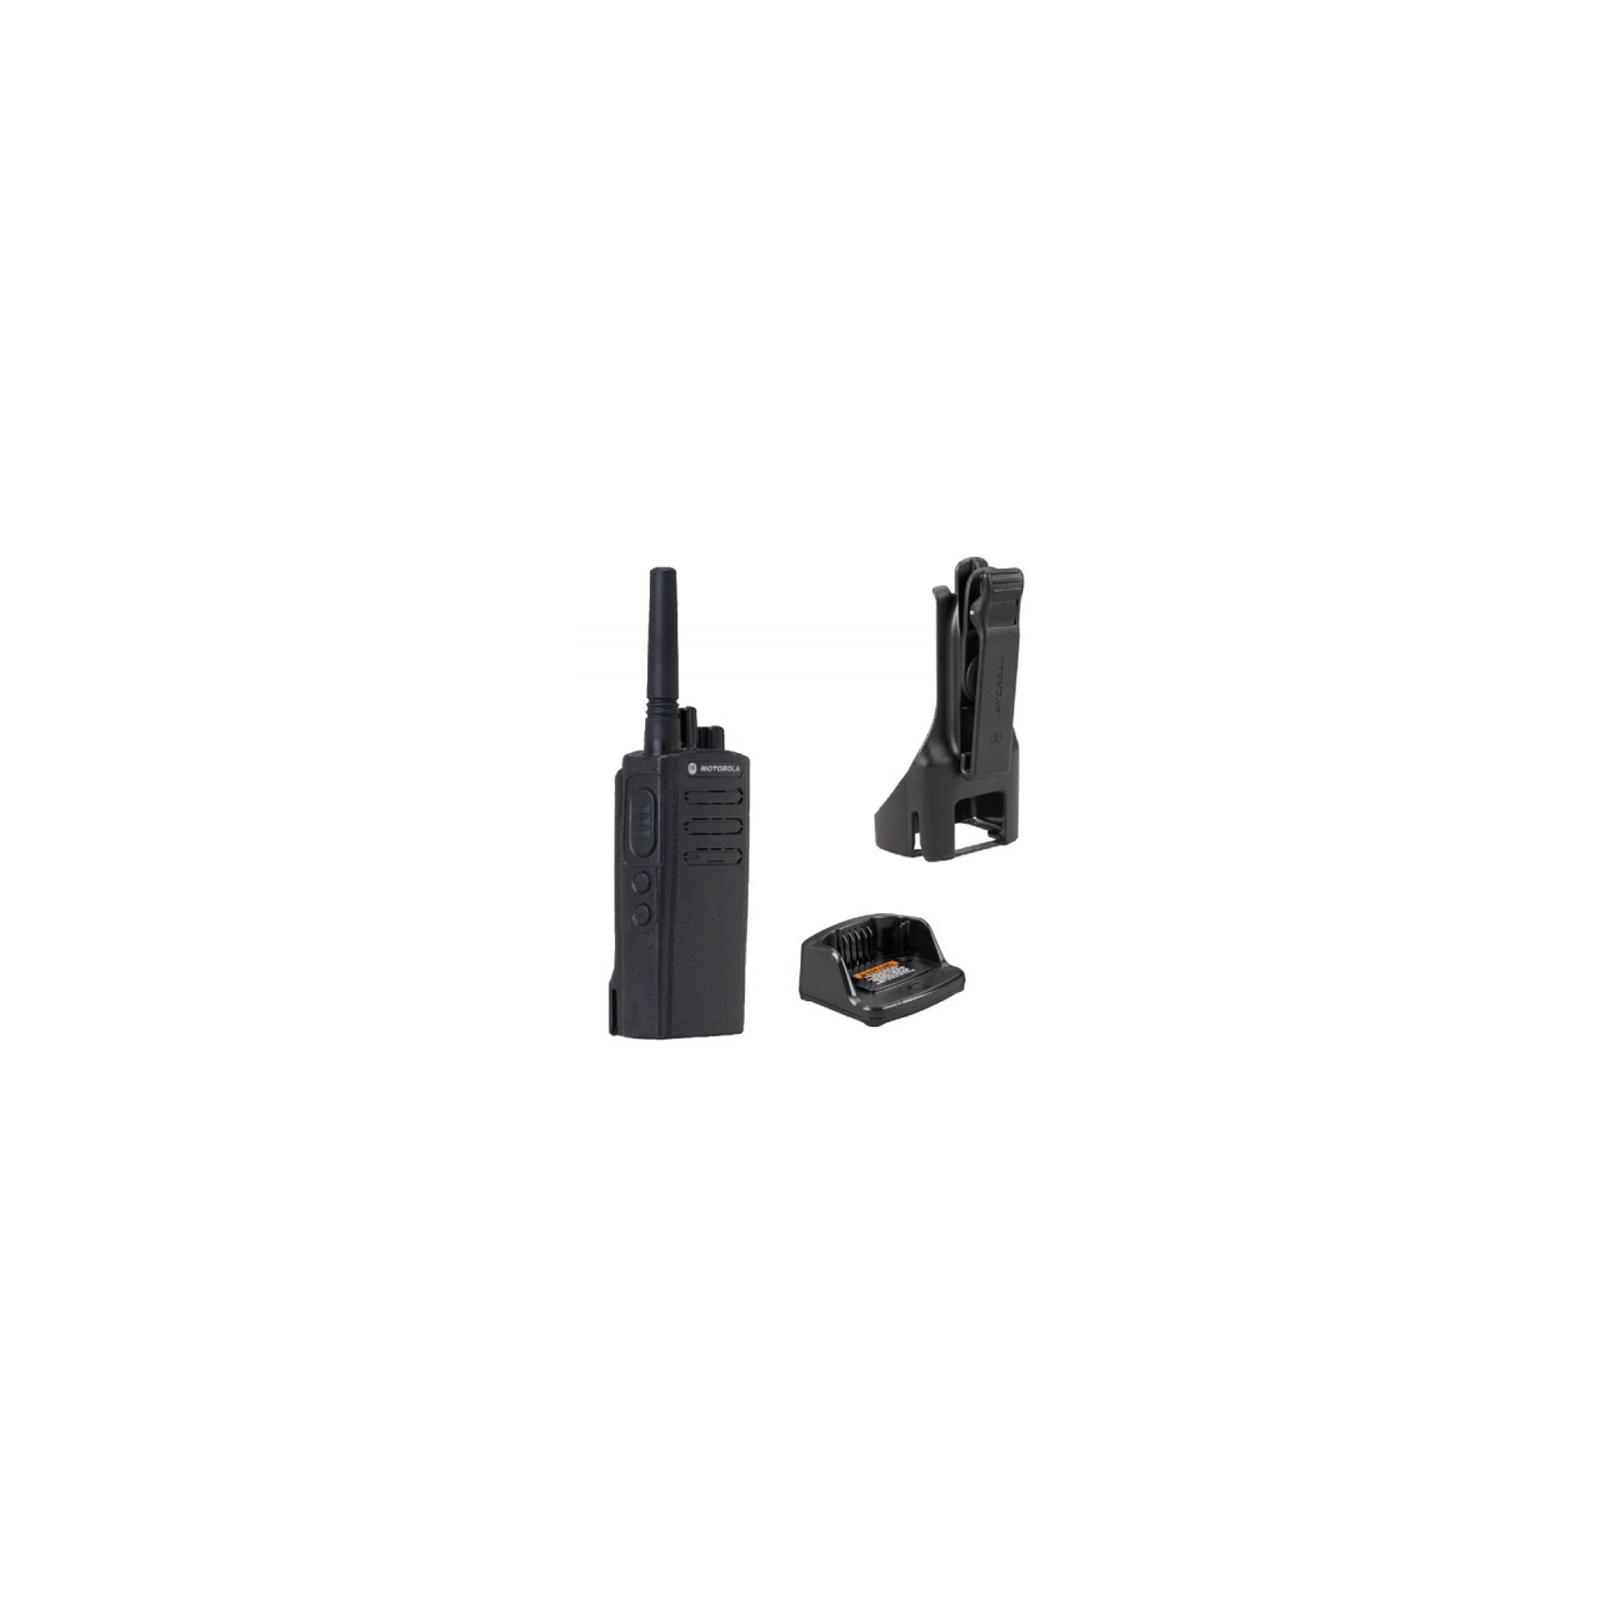 Портативная рация Motorola XT225 (XTR0166BHLAA)